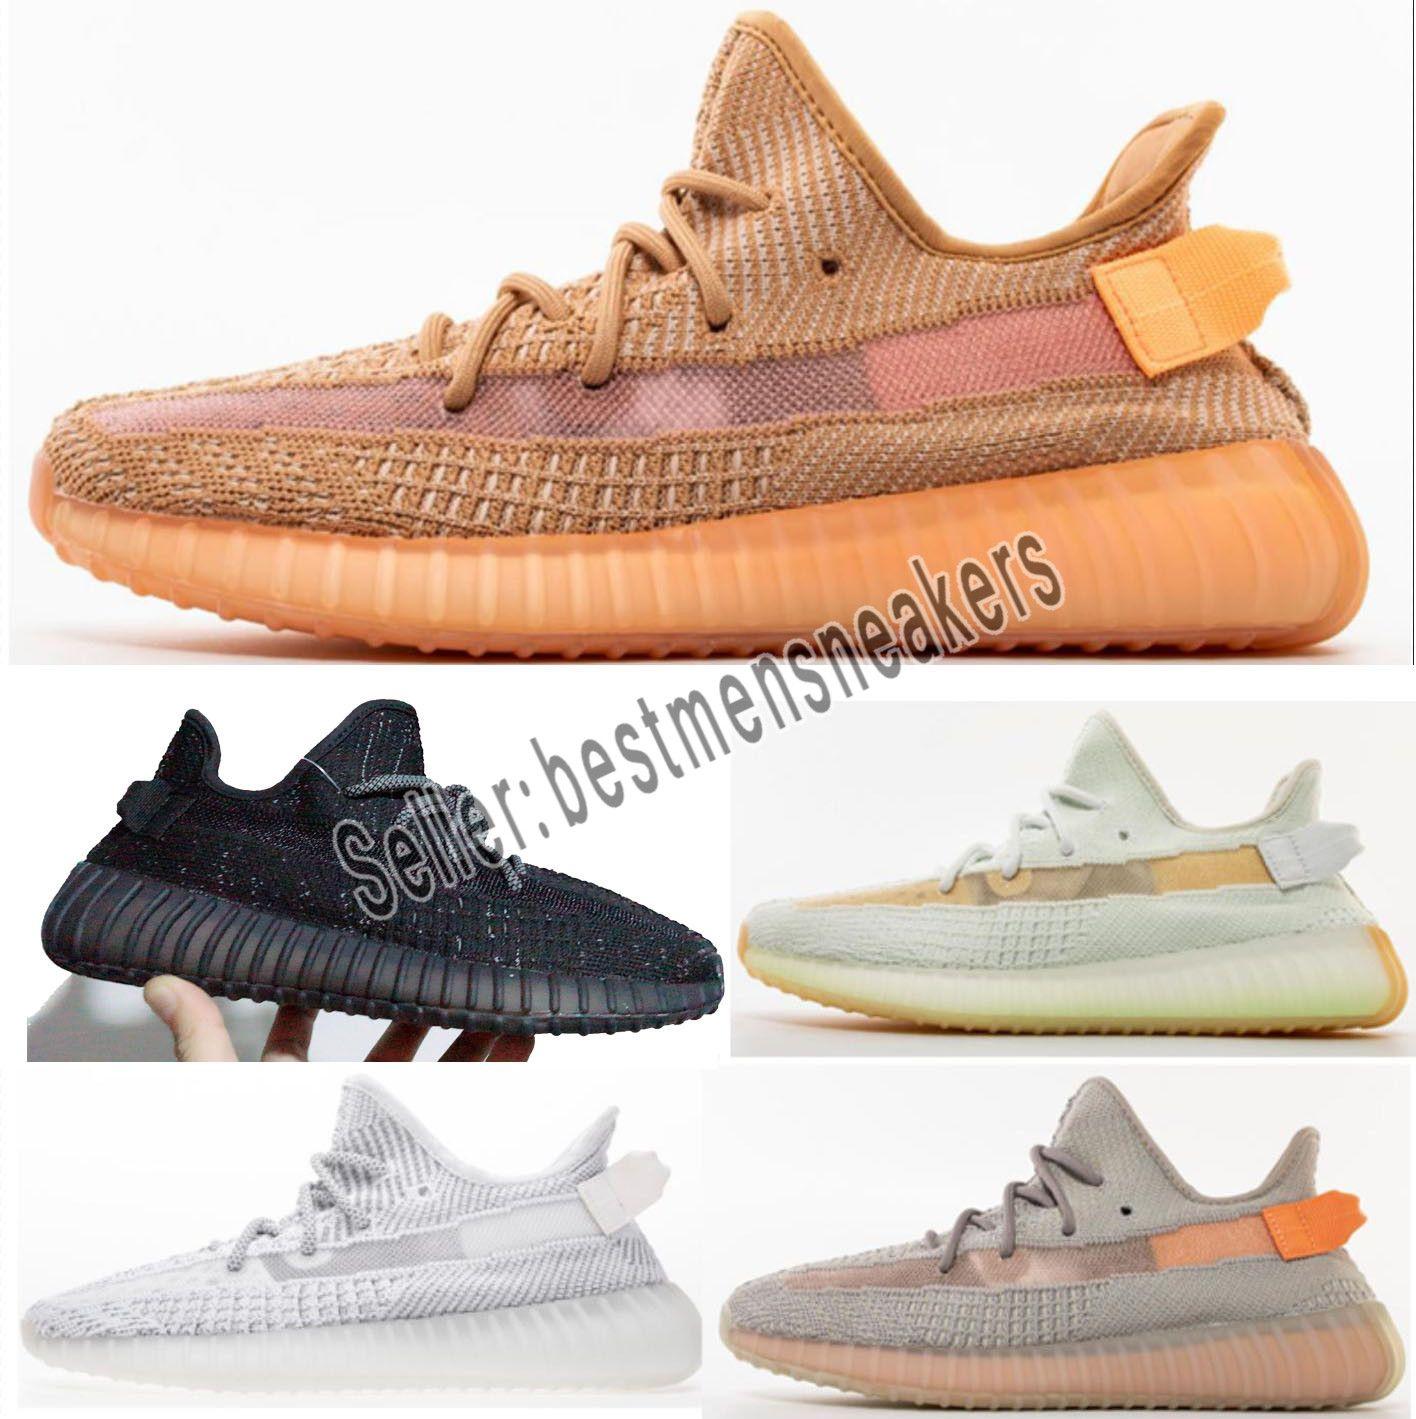 adidas yeezy boost 350 v2 scarpa uomo